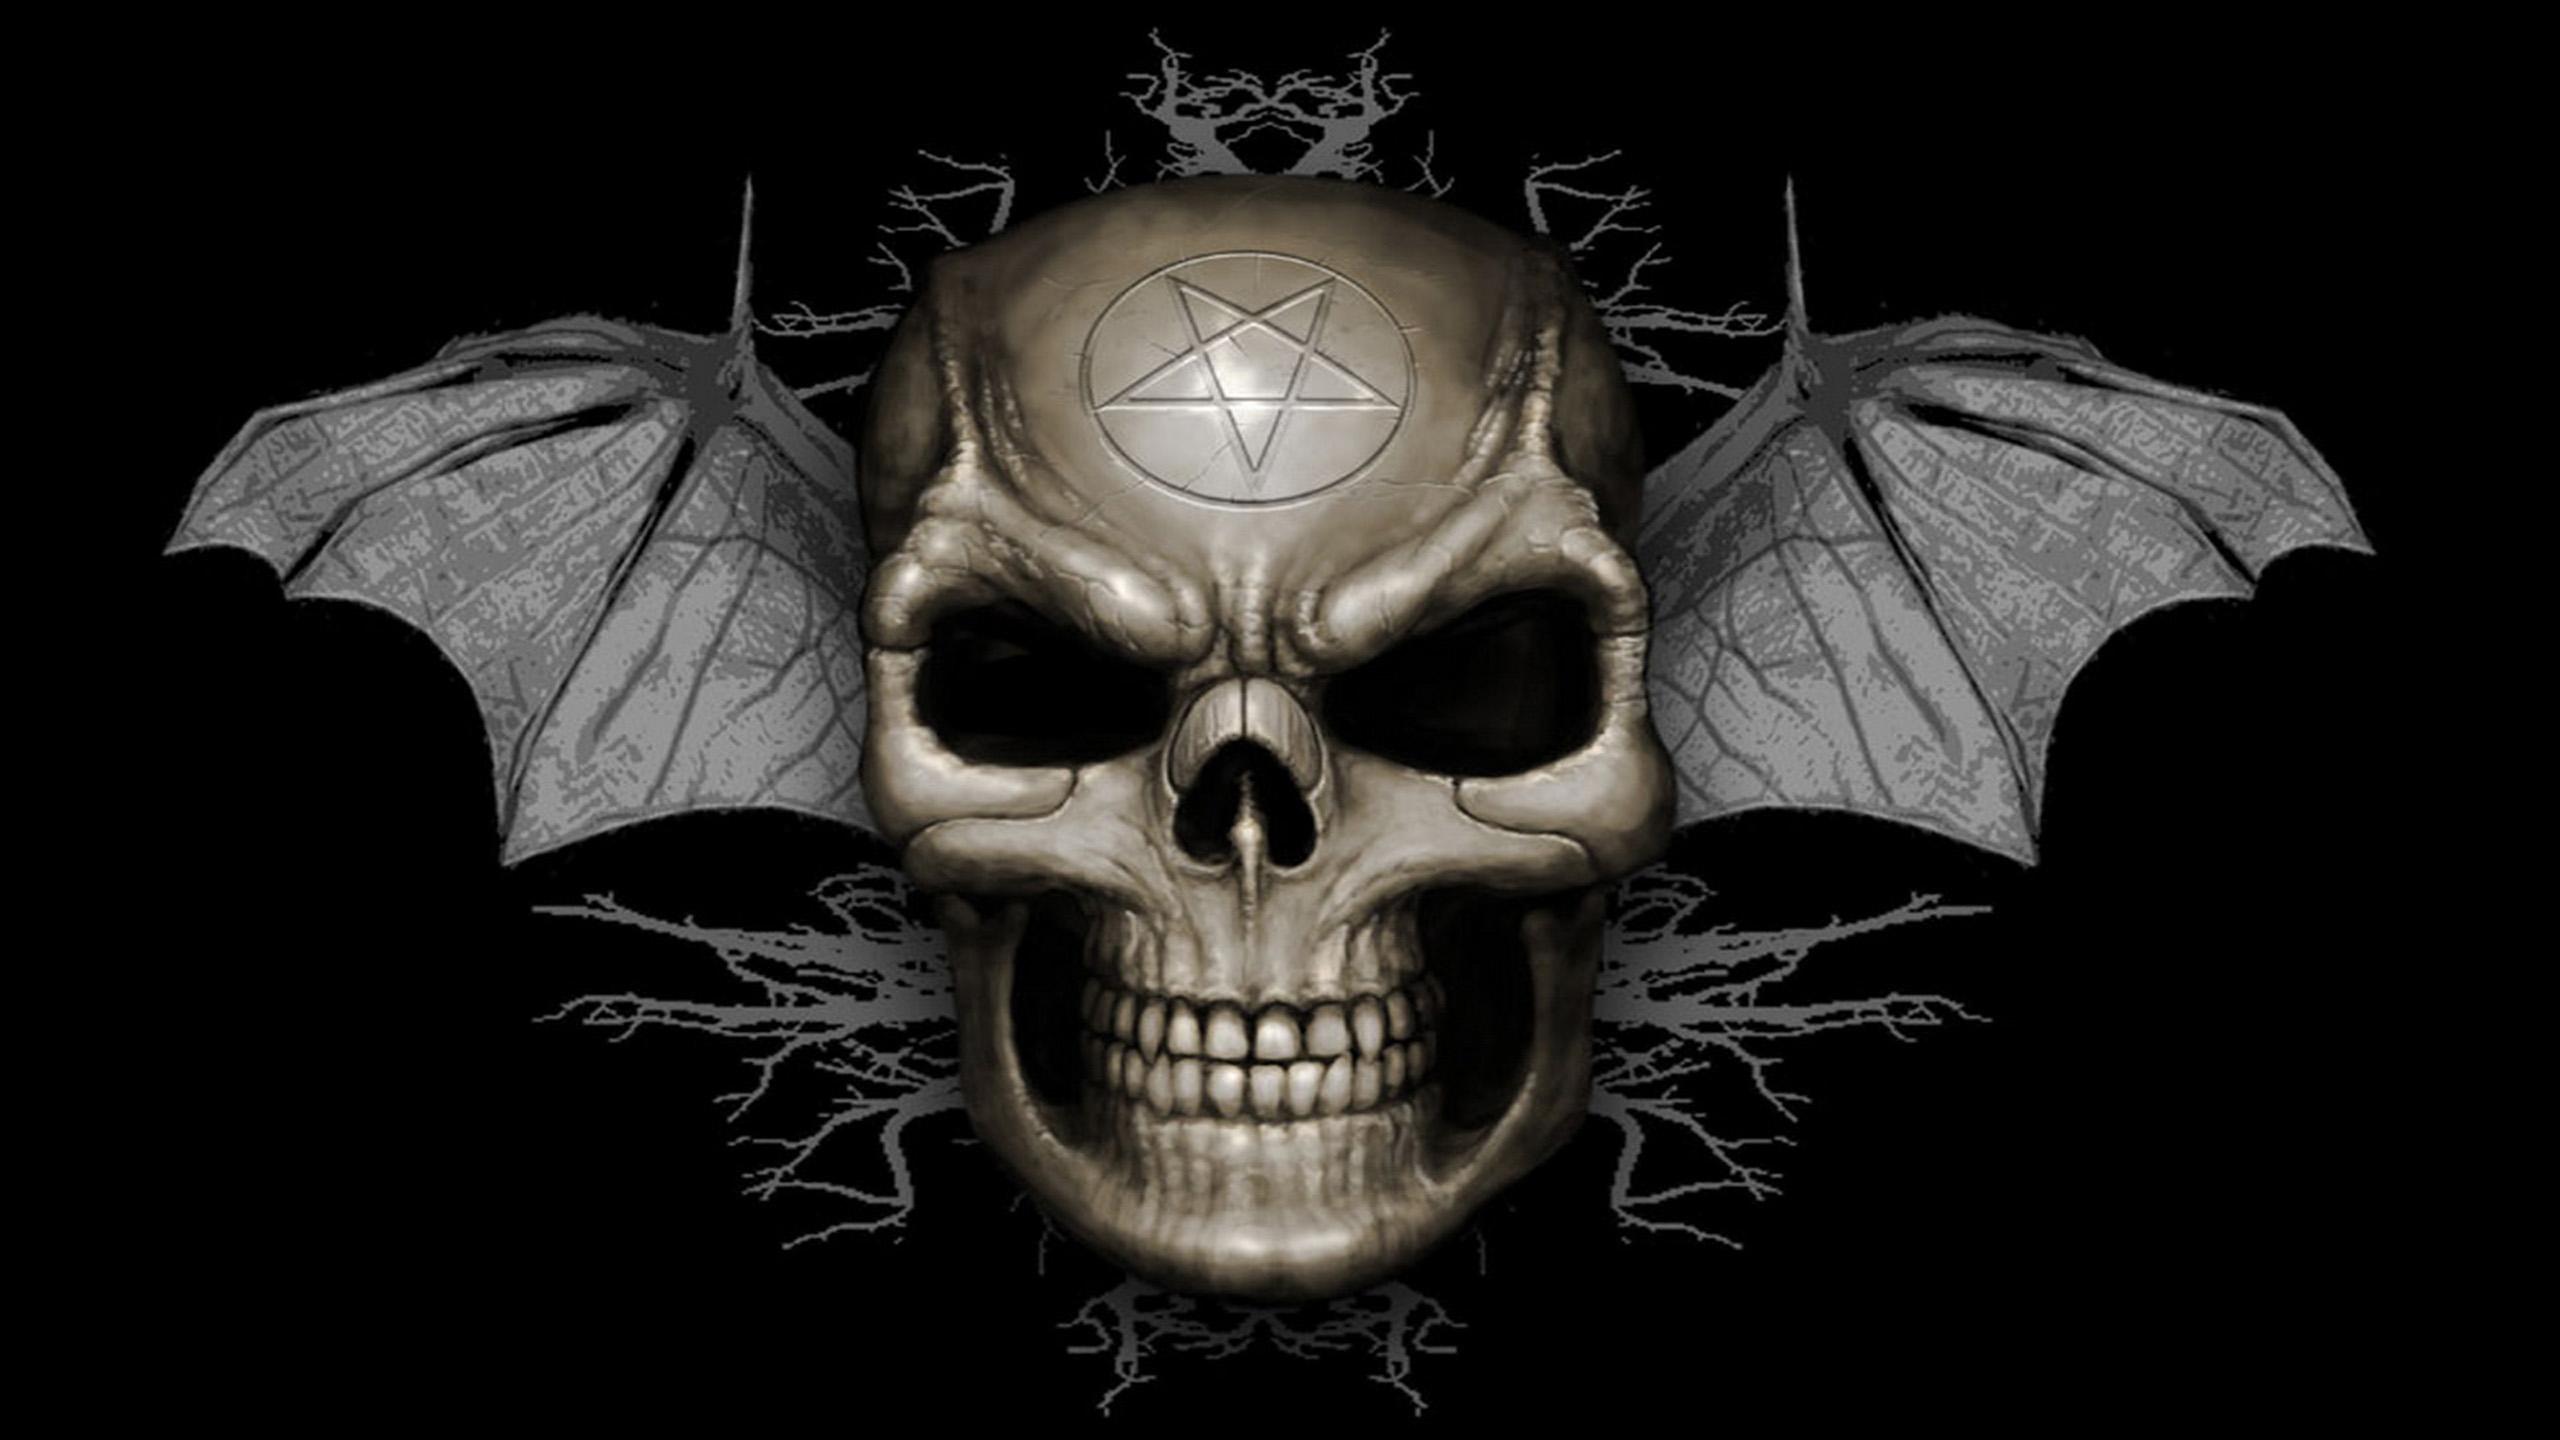 Evil skull bat wallpapers HD Desktop Wallpapers 2560x1440